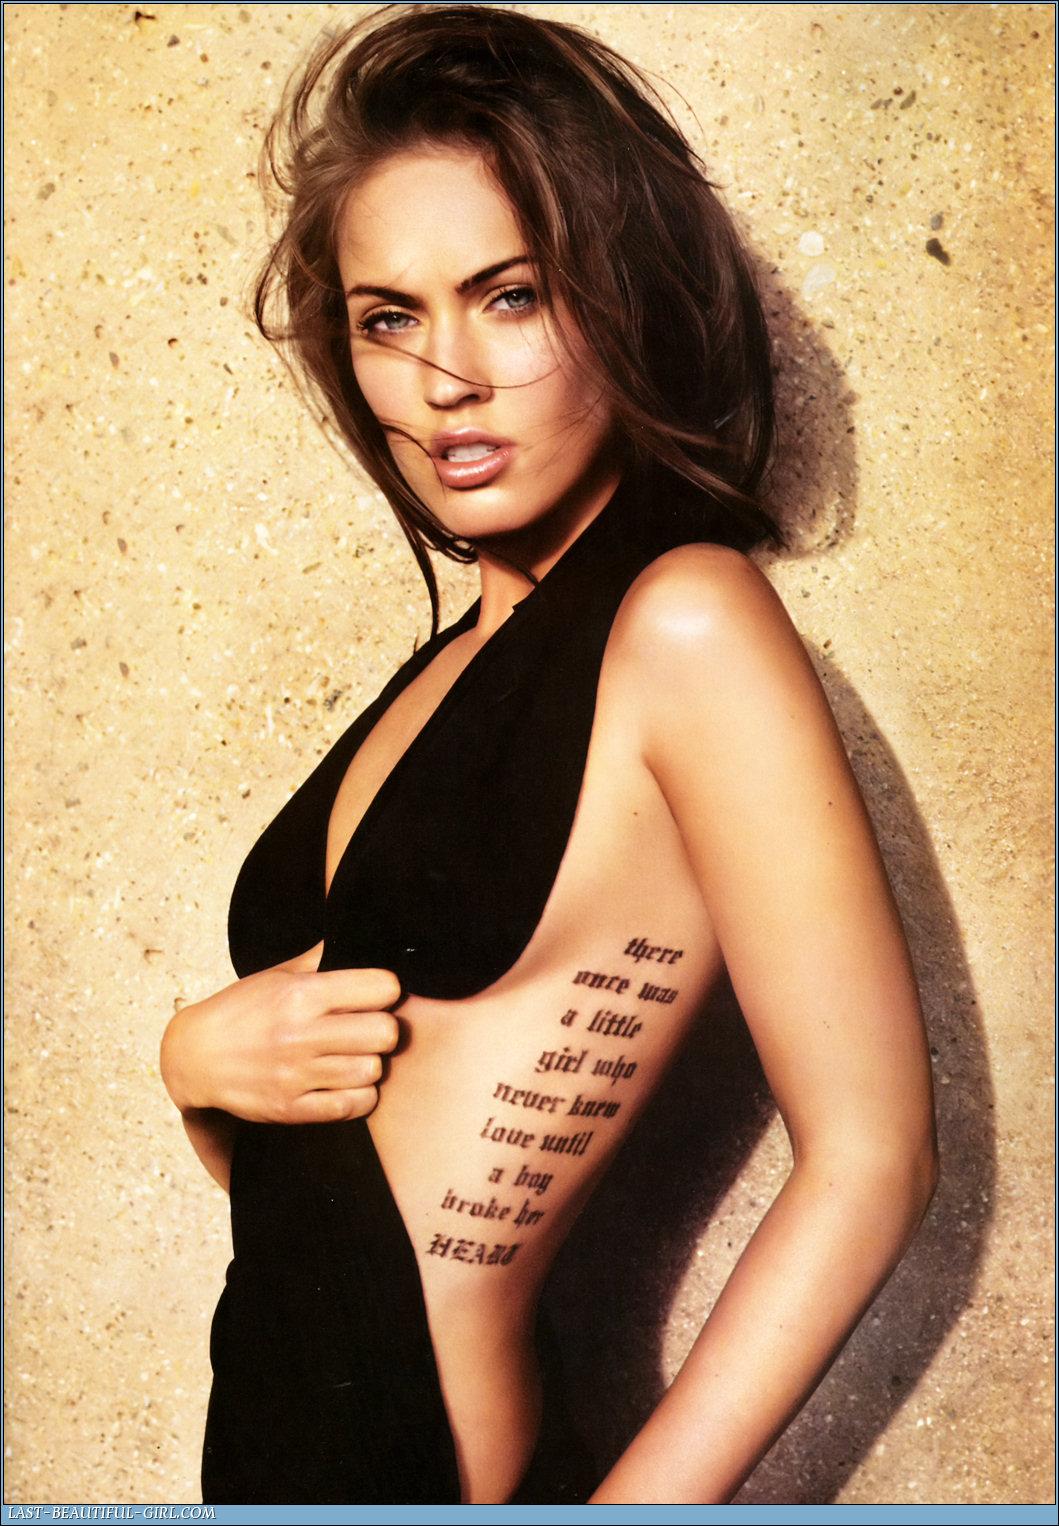 Vera glam graphic design - Photos Of Hot Sweet Amp Sexy Celebrities Super Sexy Megan Fox Is